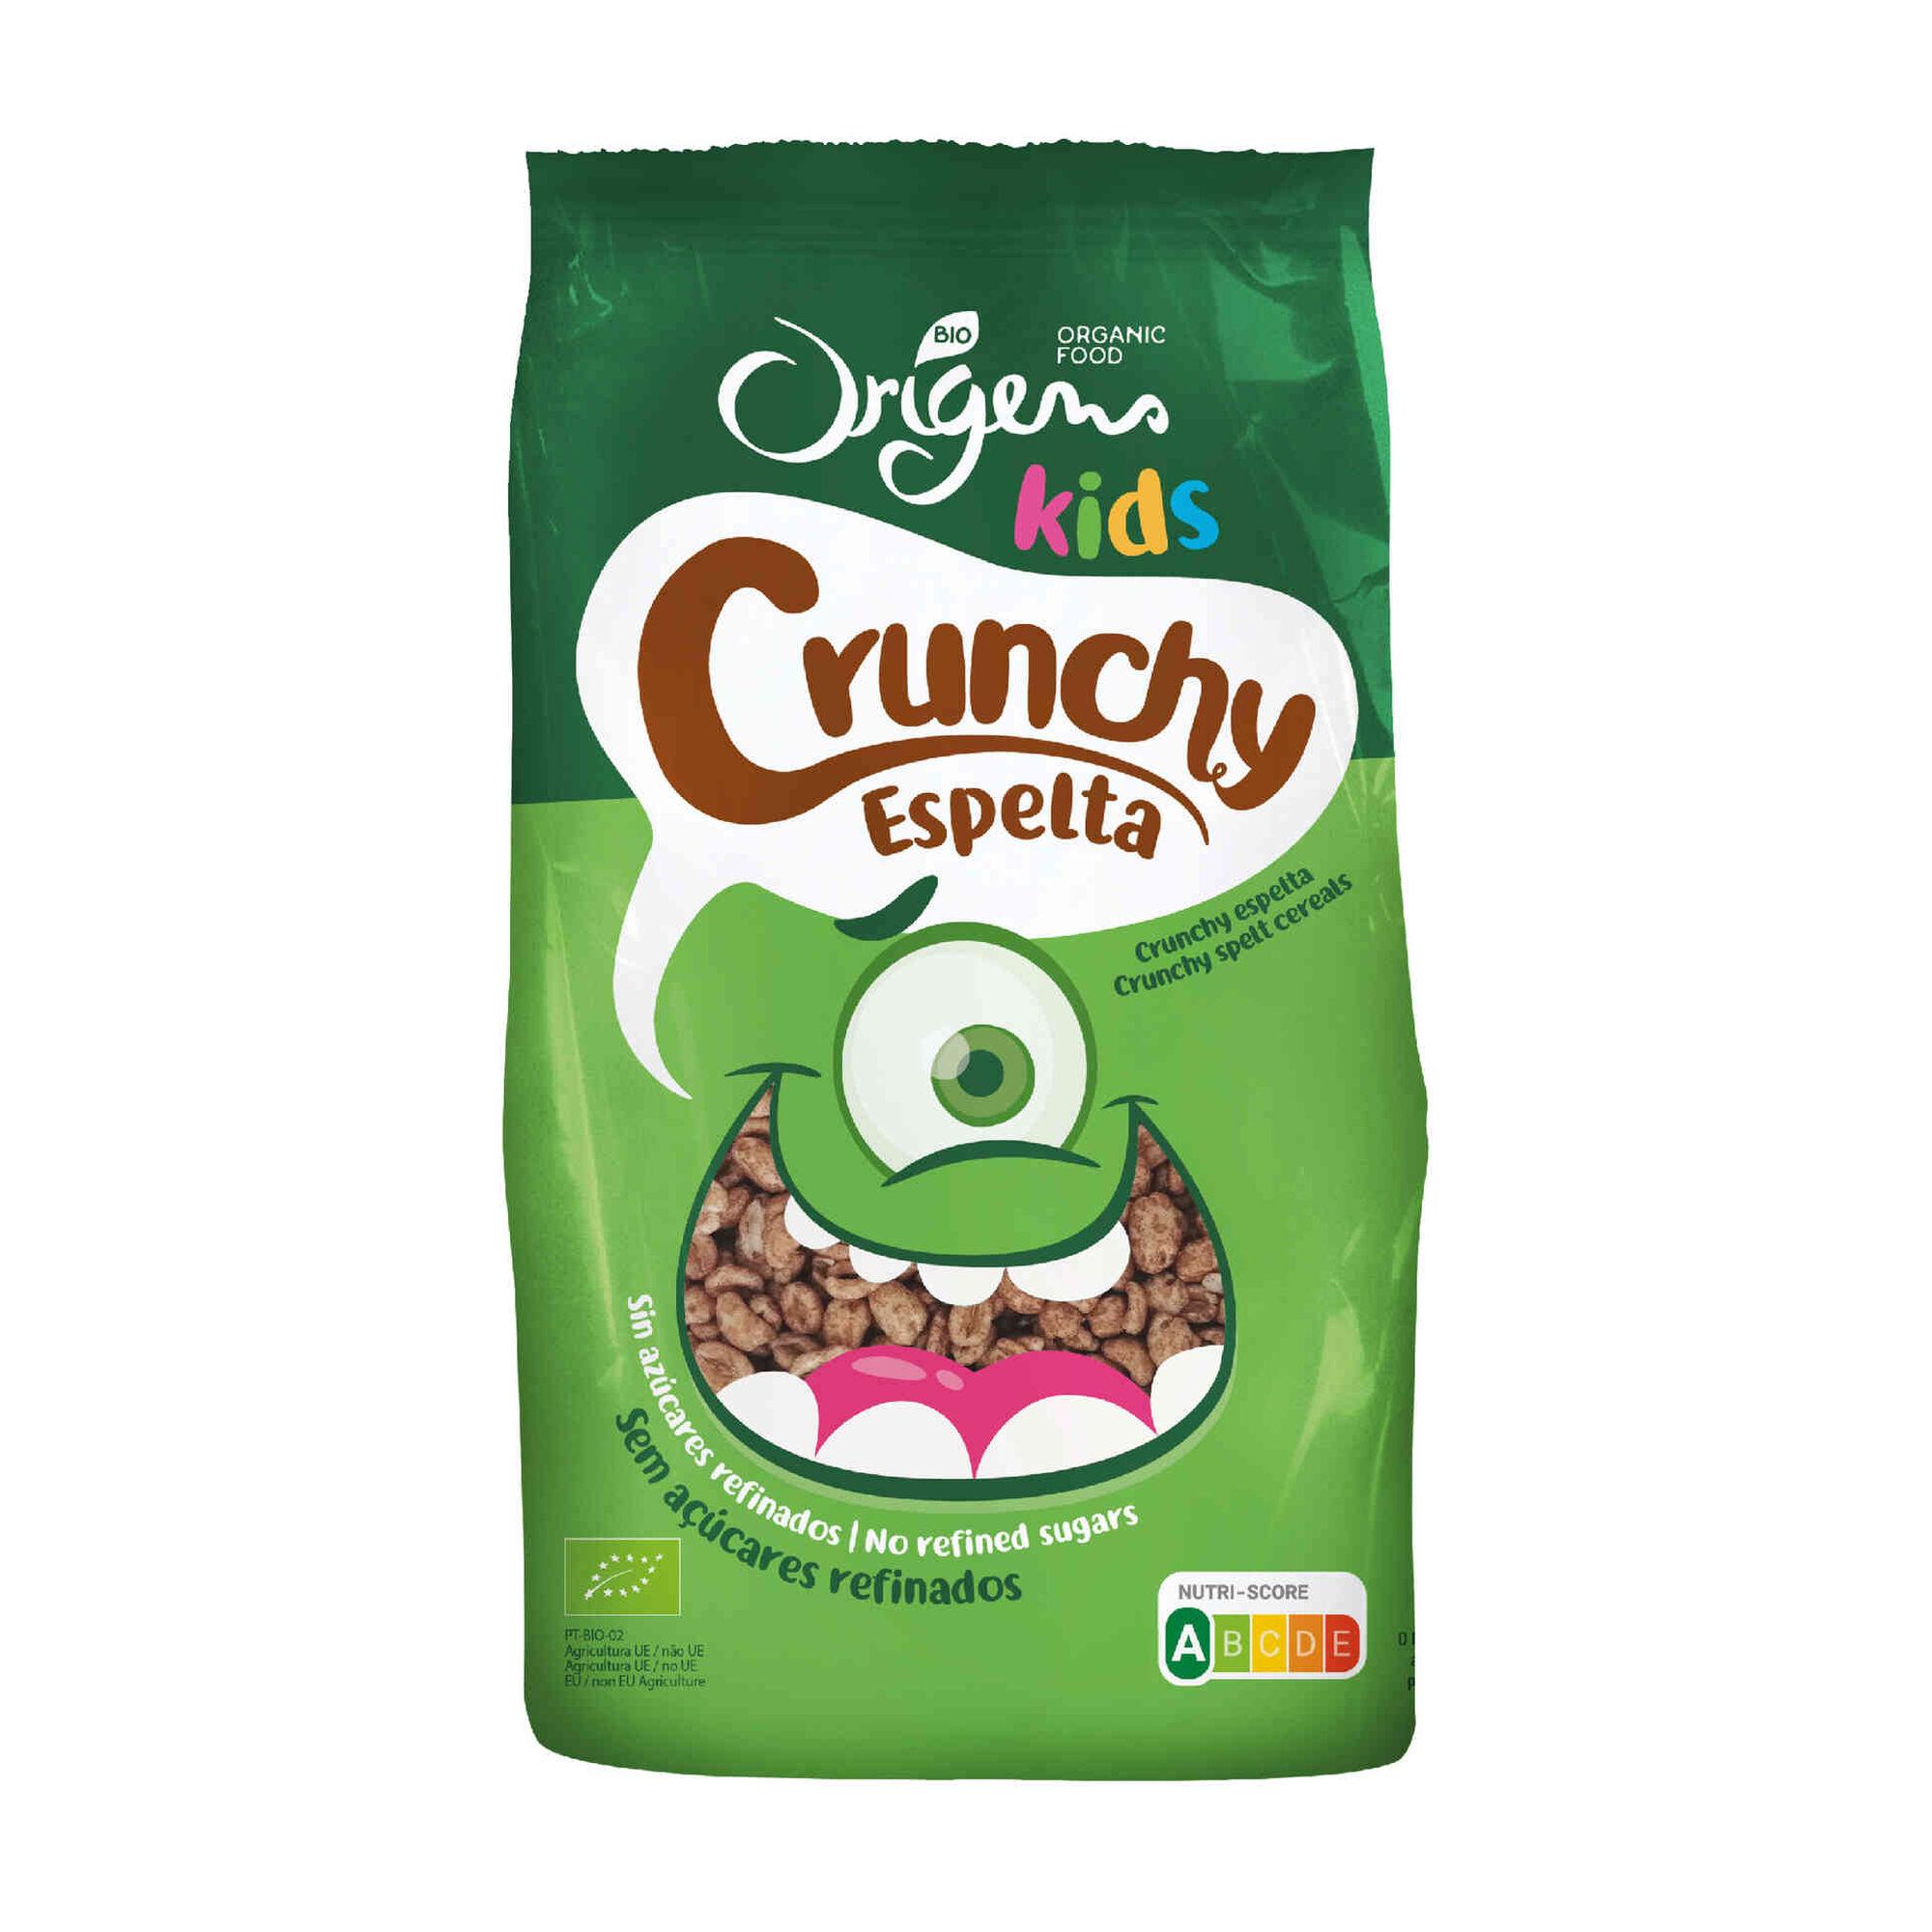 Cereais Crunchy Kids Espelta